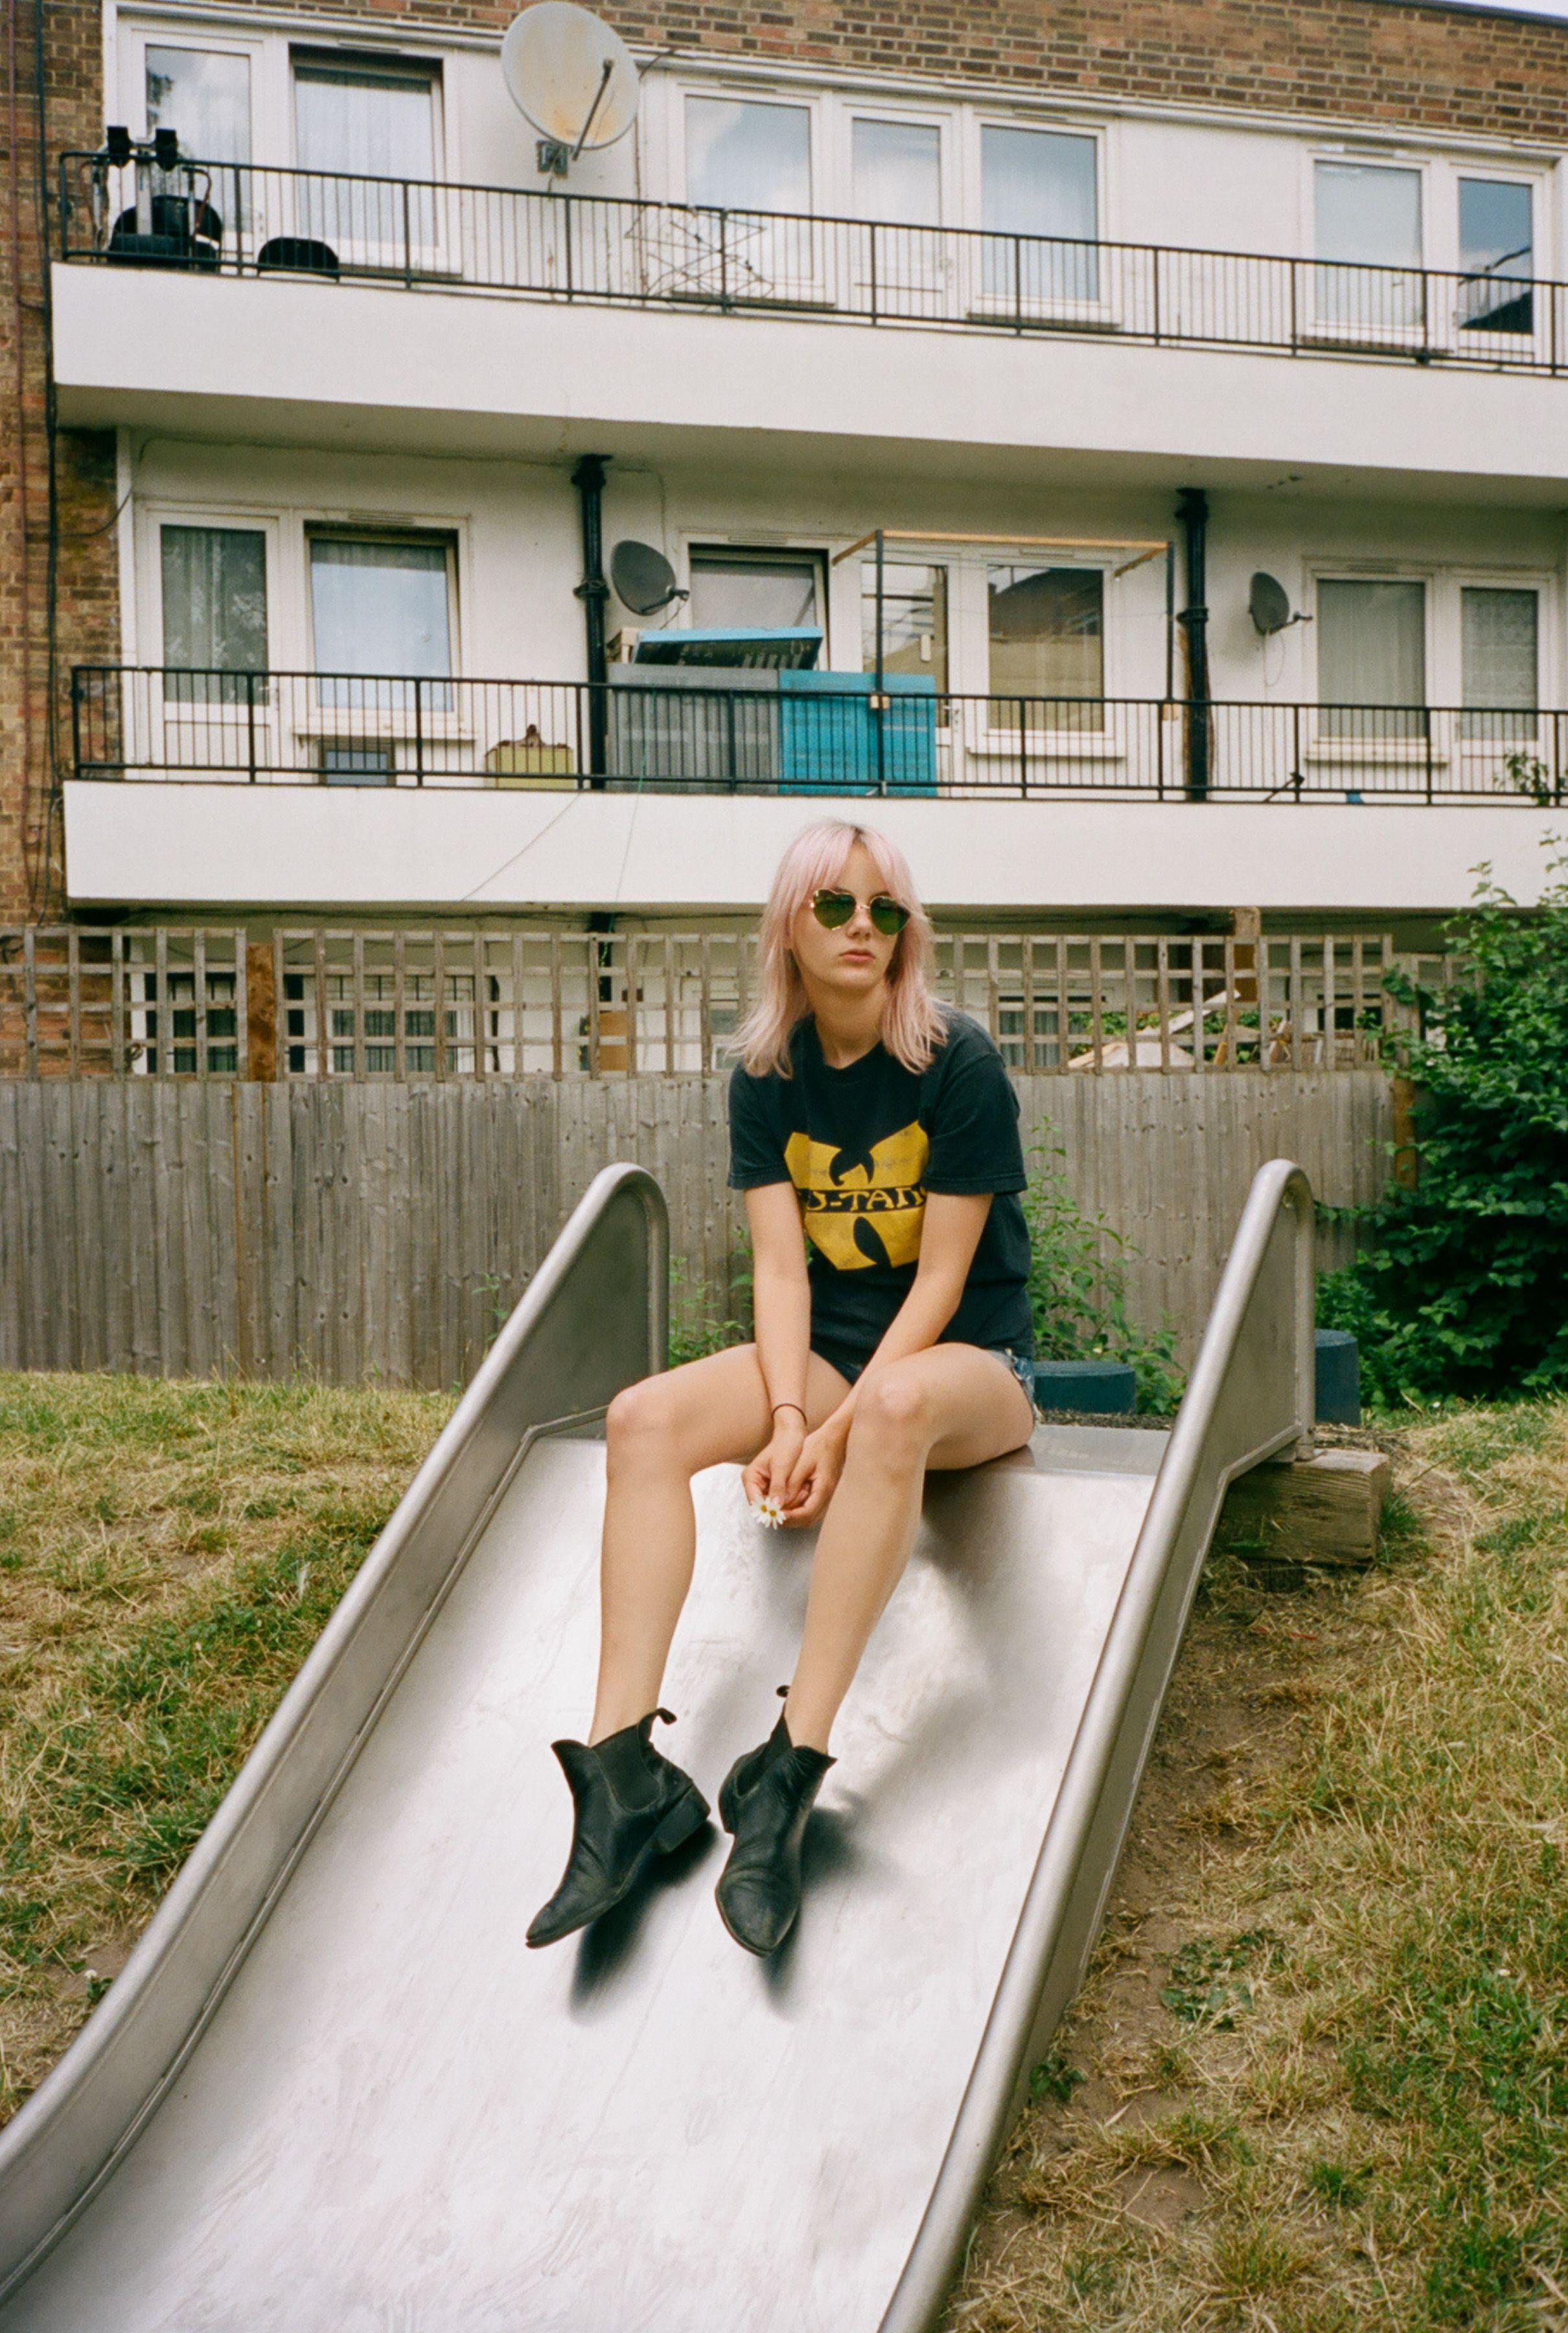 Walnut Wax shoots model Jess in London on 35mm for Fashion Grunge  http://fashiongrunge.com/2016/08/14/jess-by-walnutwax/